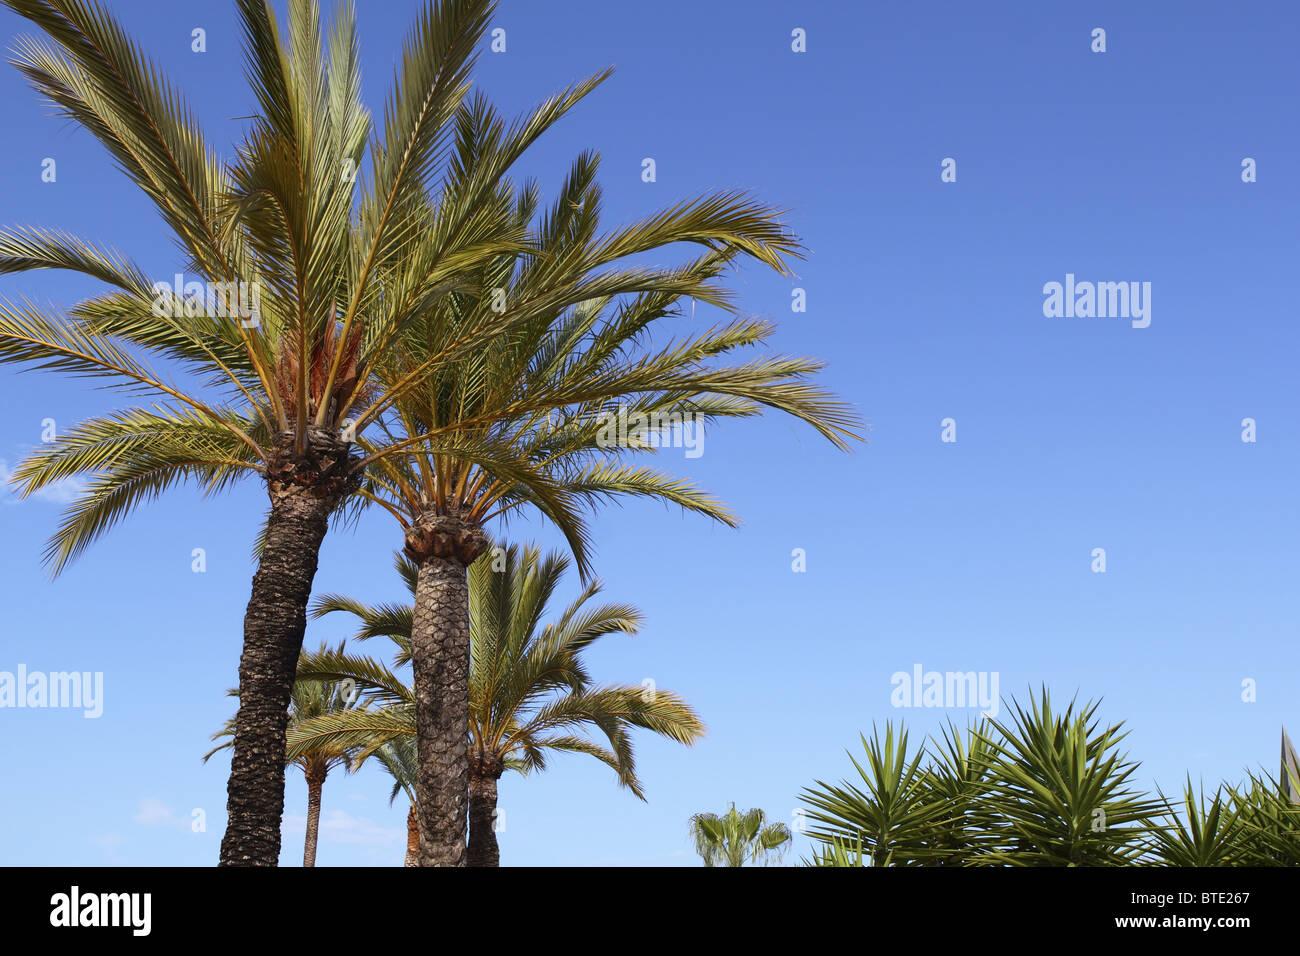 phoenix canariensis palm trees blue sky in mediterranean Spain - Stock Image